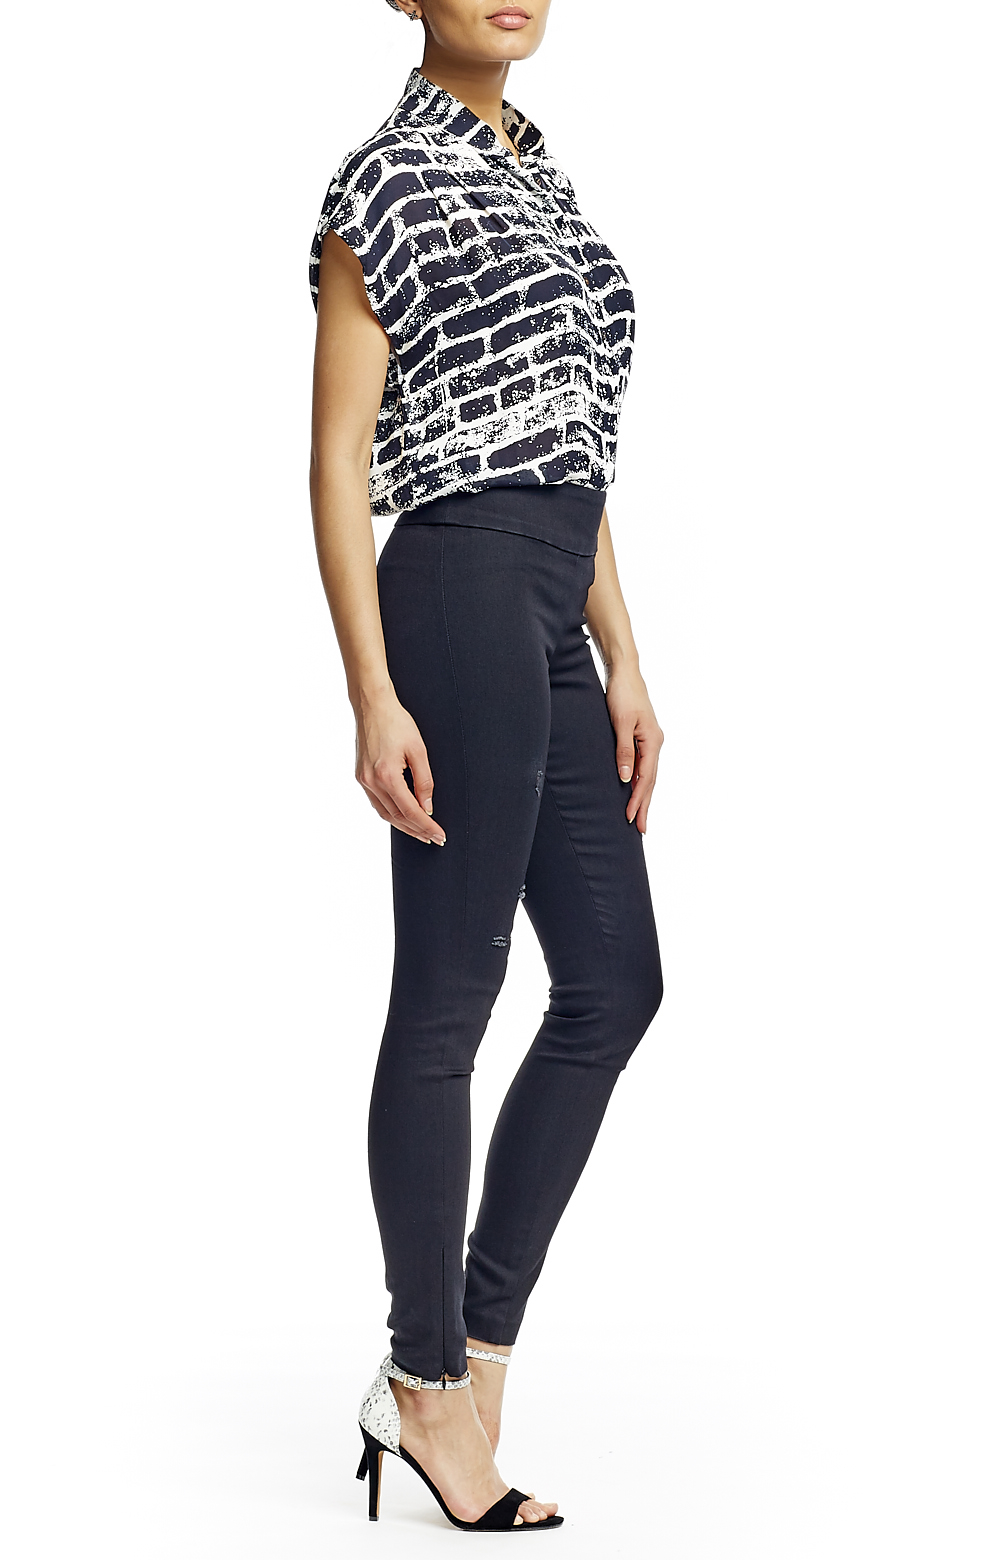 Nicole miller Nina Slim Pants in Black